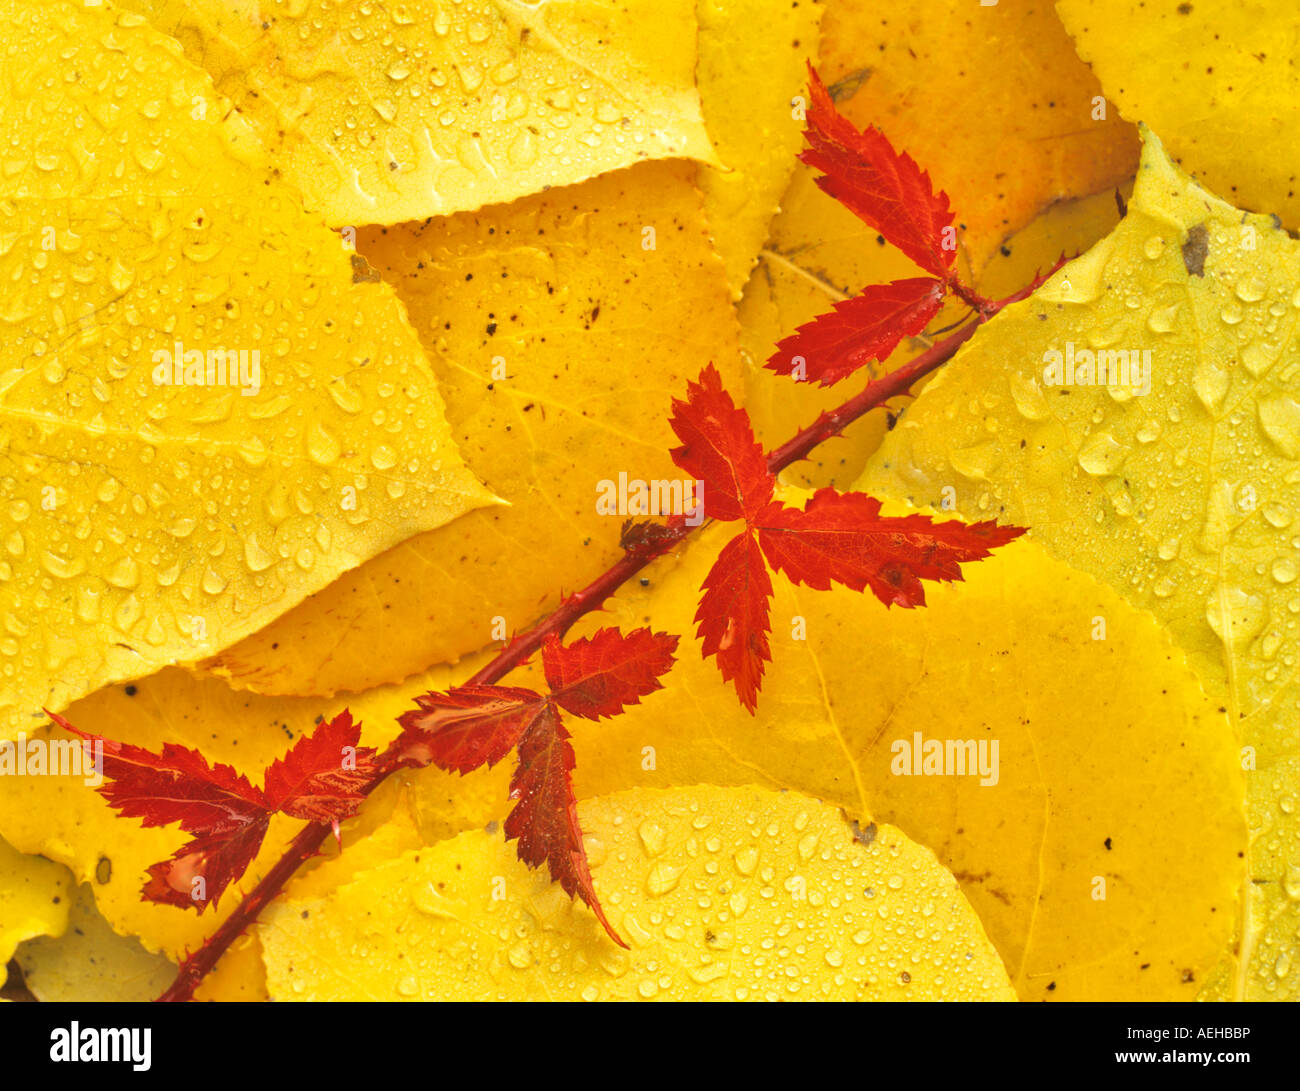 Blackberry vine in fall color in aspen leaves Near Alpine OR - Stock Image